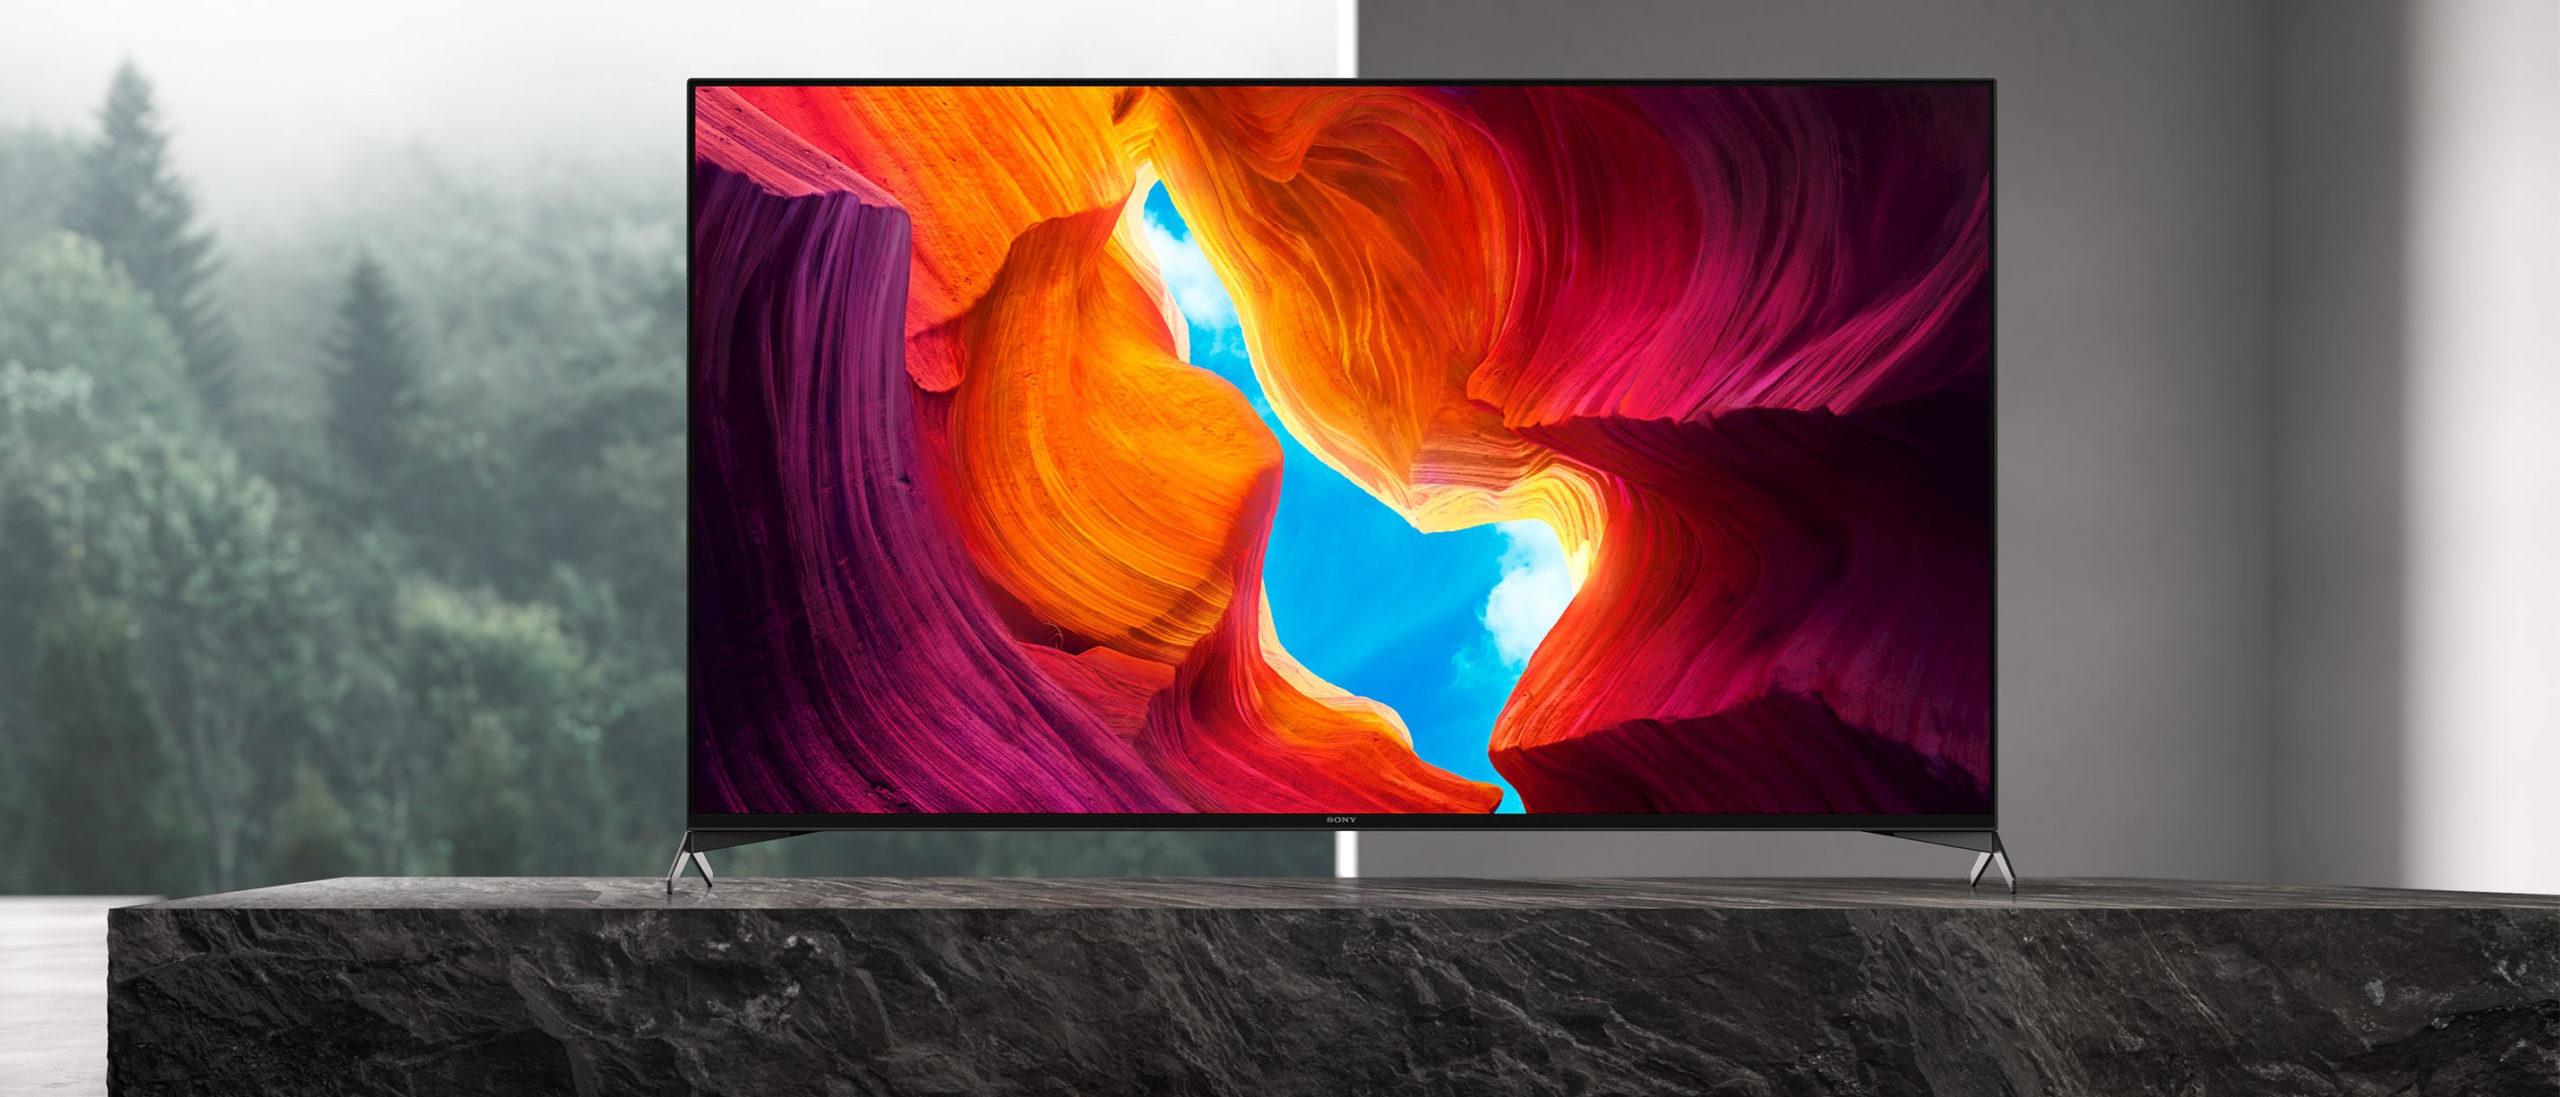 Sony X950H/XH9505: best LED LCD TV